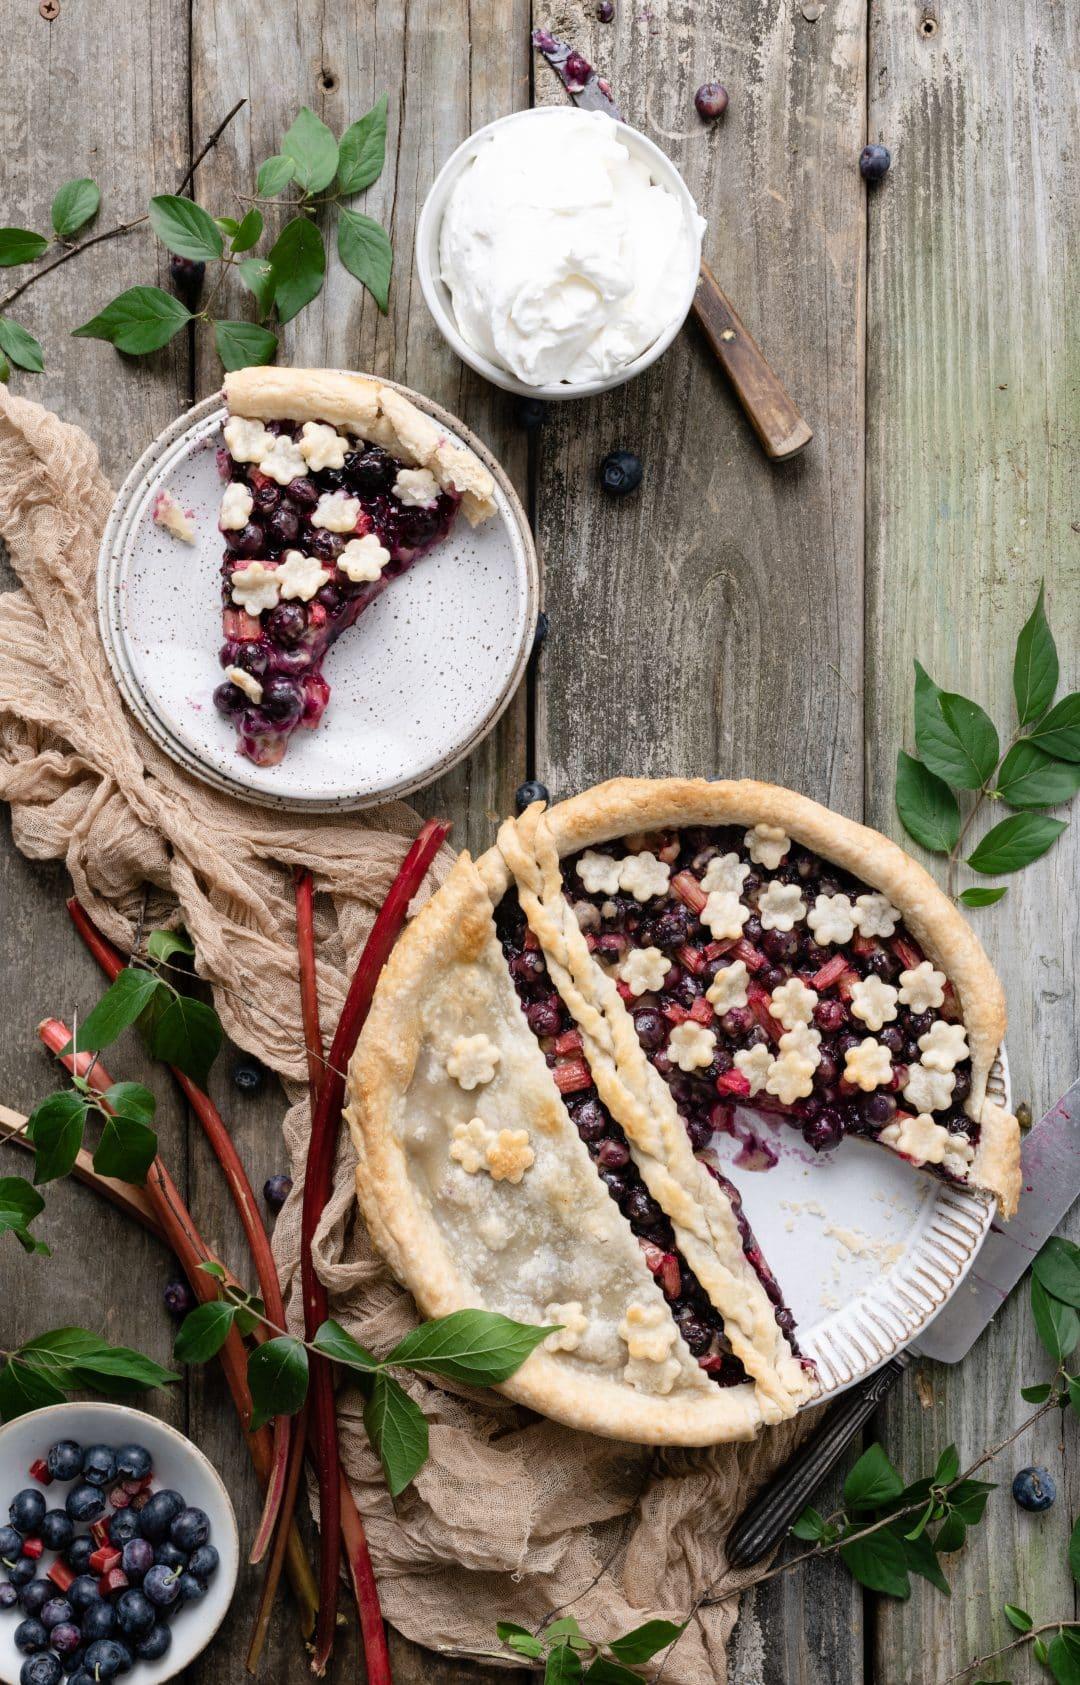 Sliced Blueberry Rhubarb Pie with flower crust design